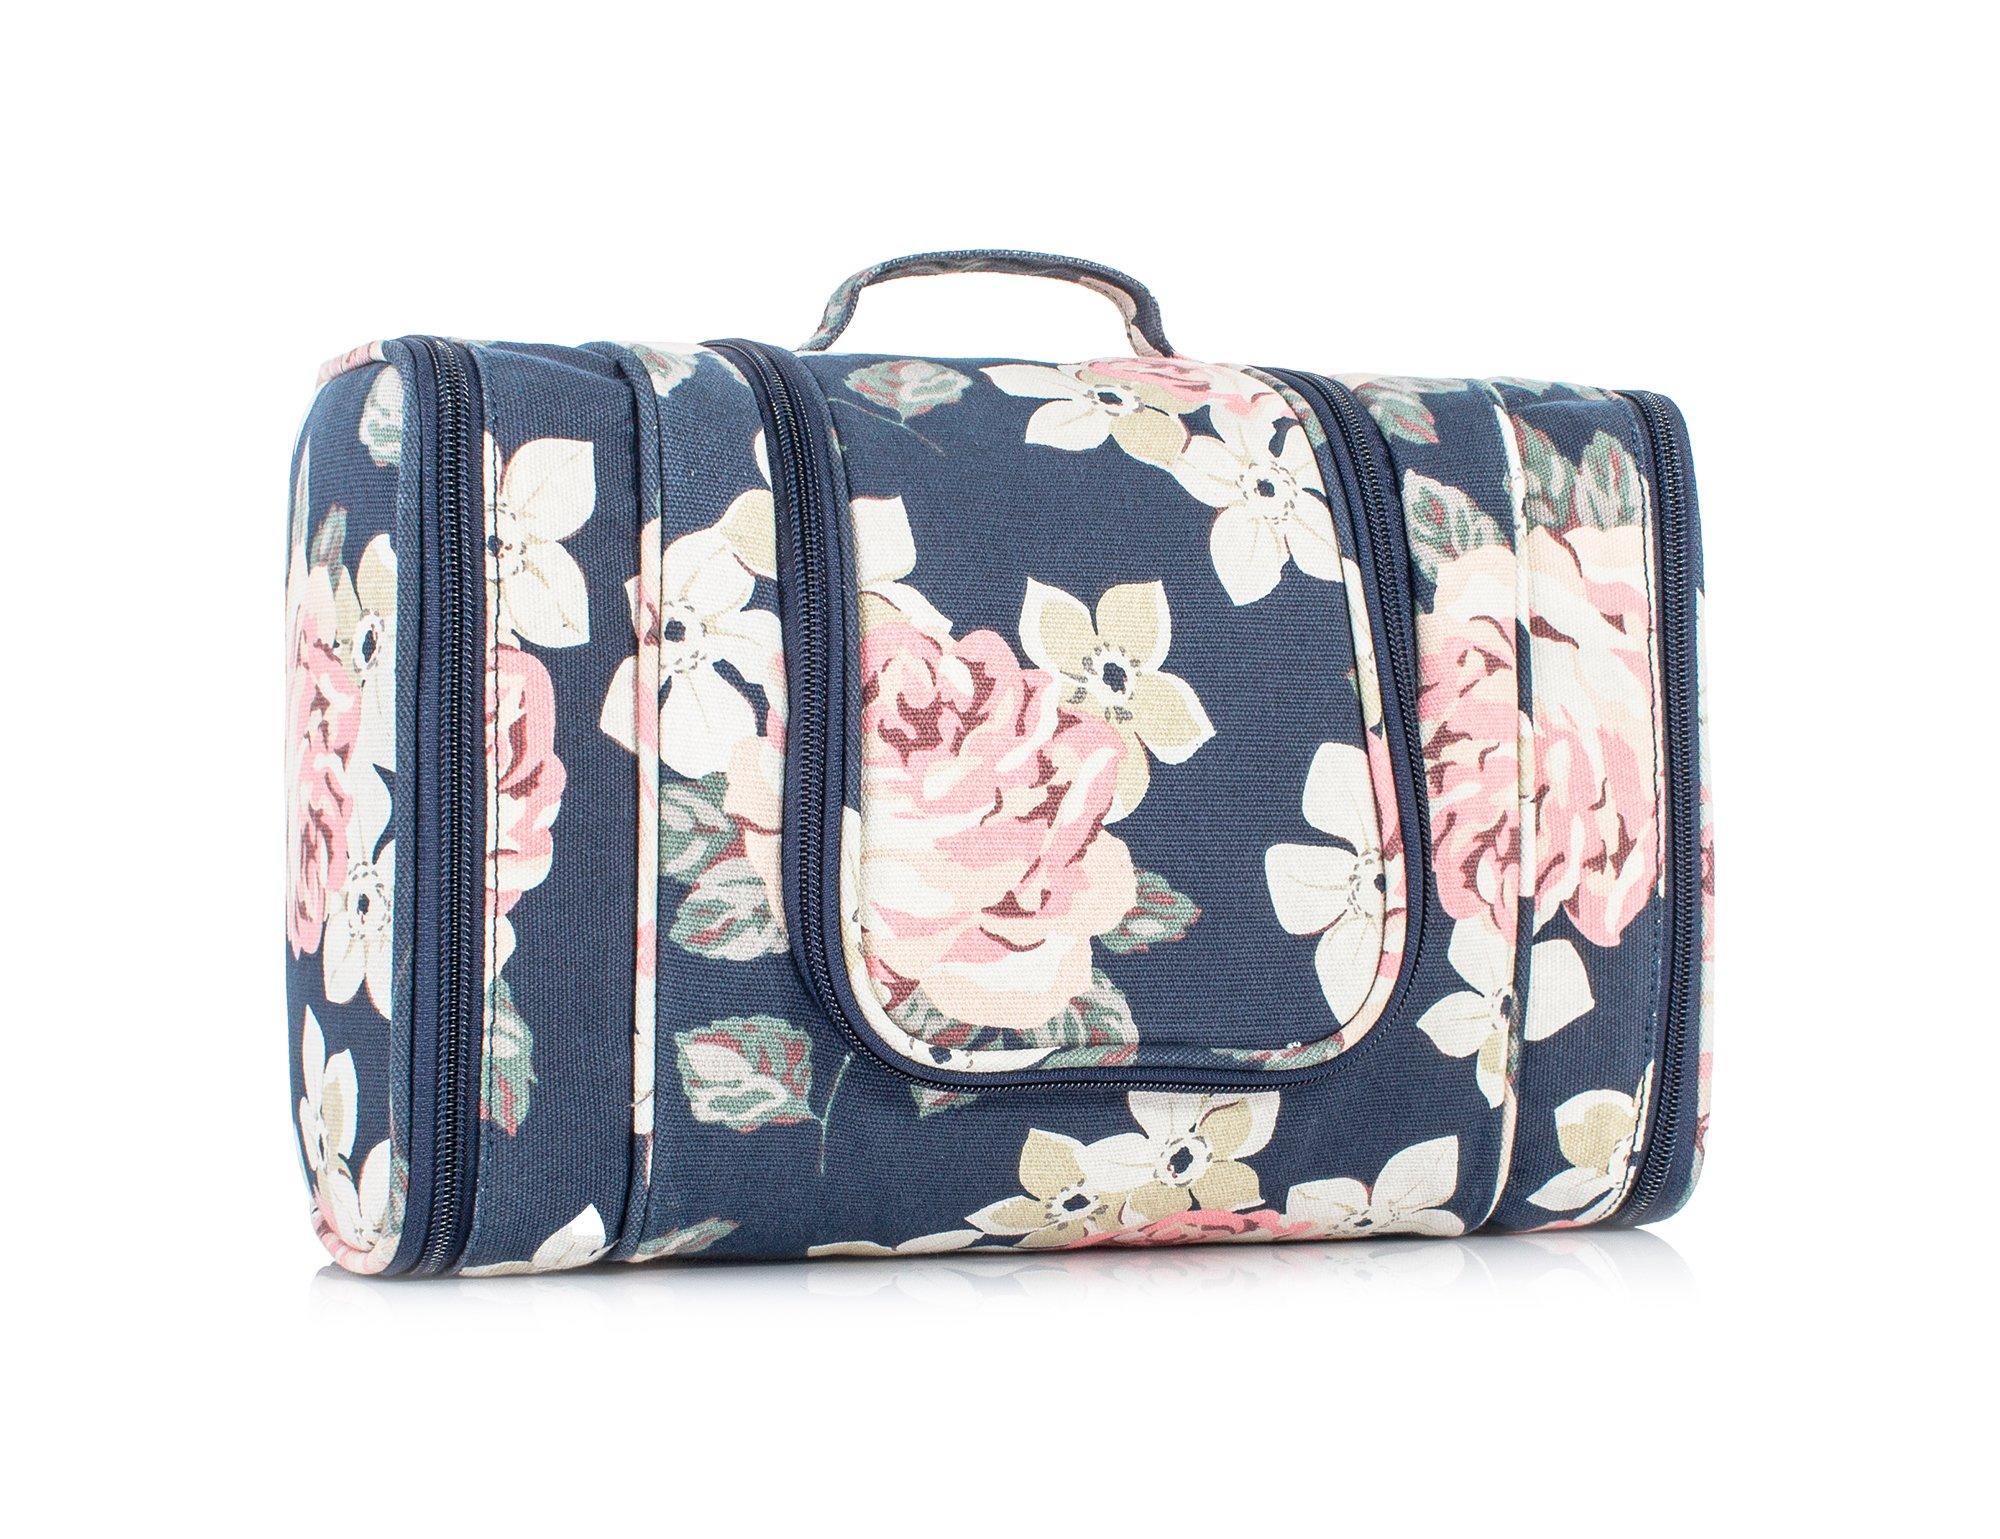 Multifunctional Cosmetic Bag Toiletry Bag Bathroom Storage Women Travel Bag Hanging Organizer Bag by TOPERIN (Floral dark blue)